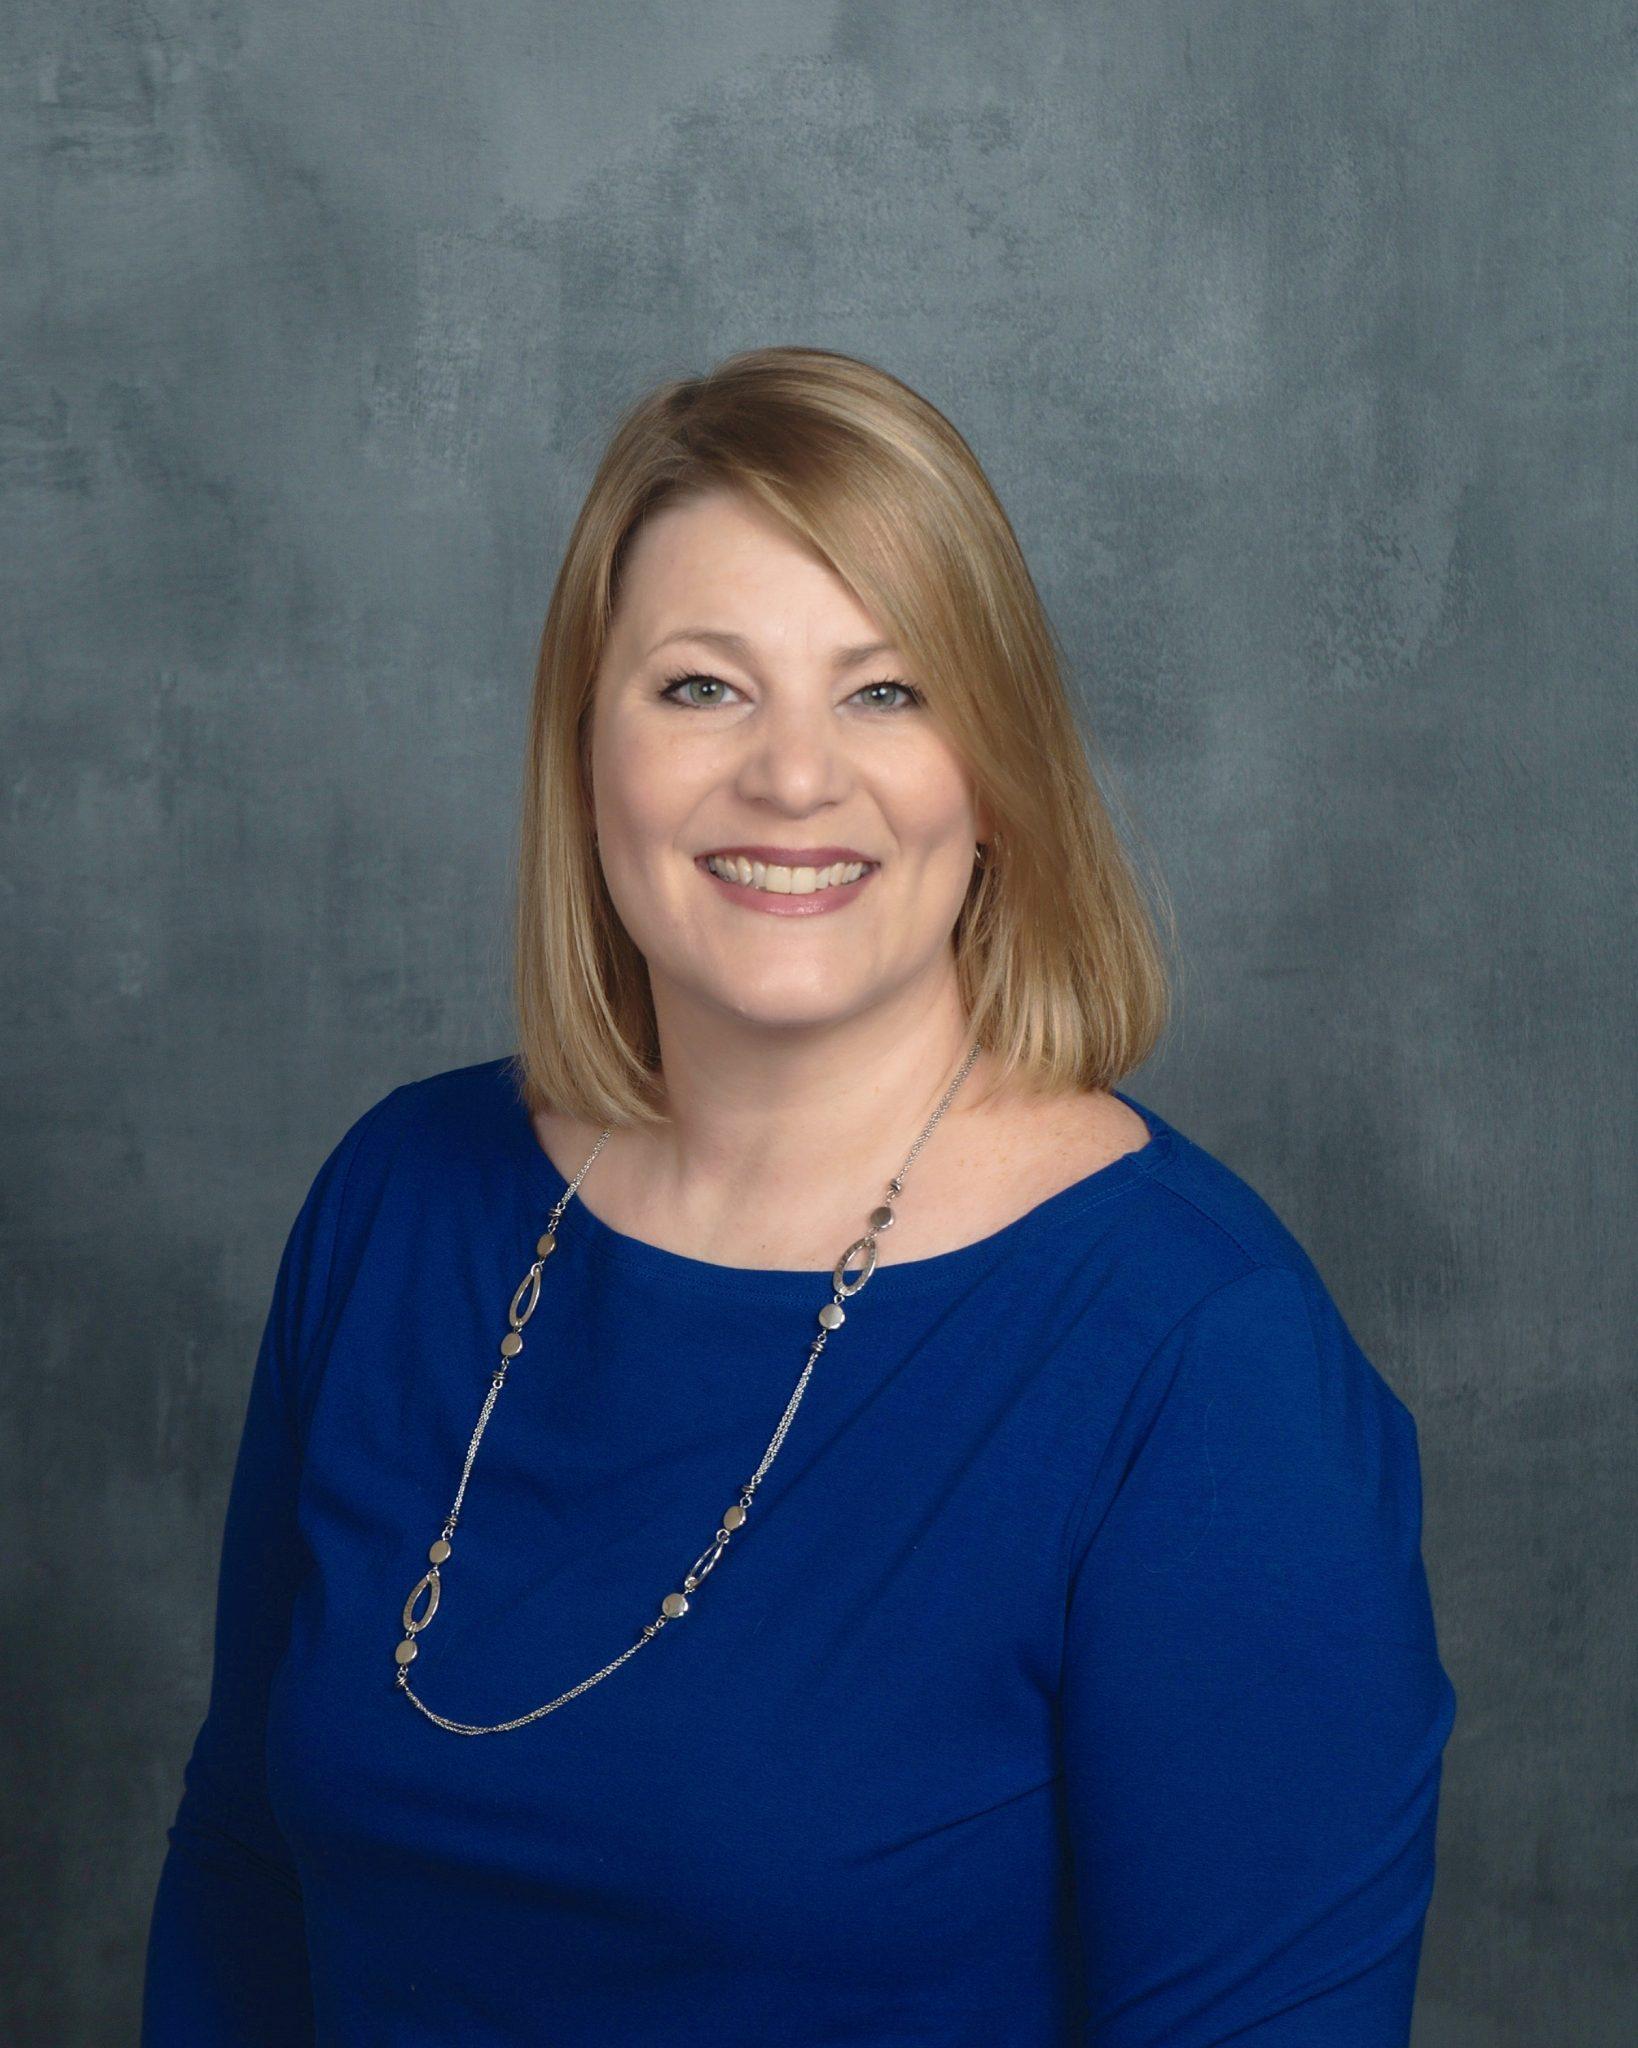 Jennifer Shelton-Guzman, Executive Director